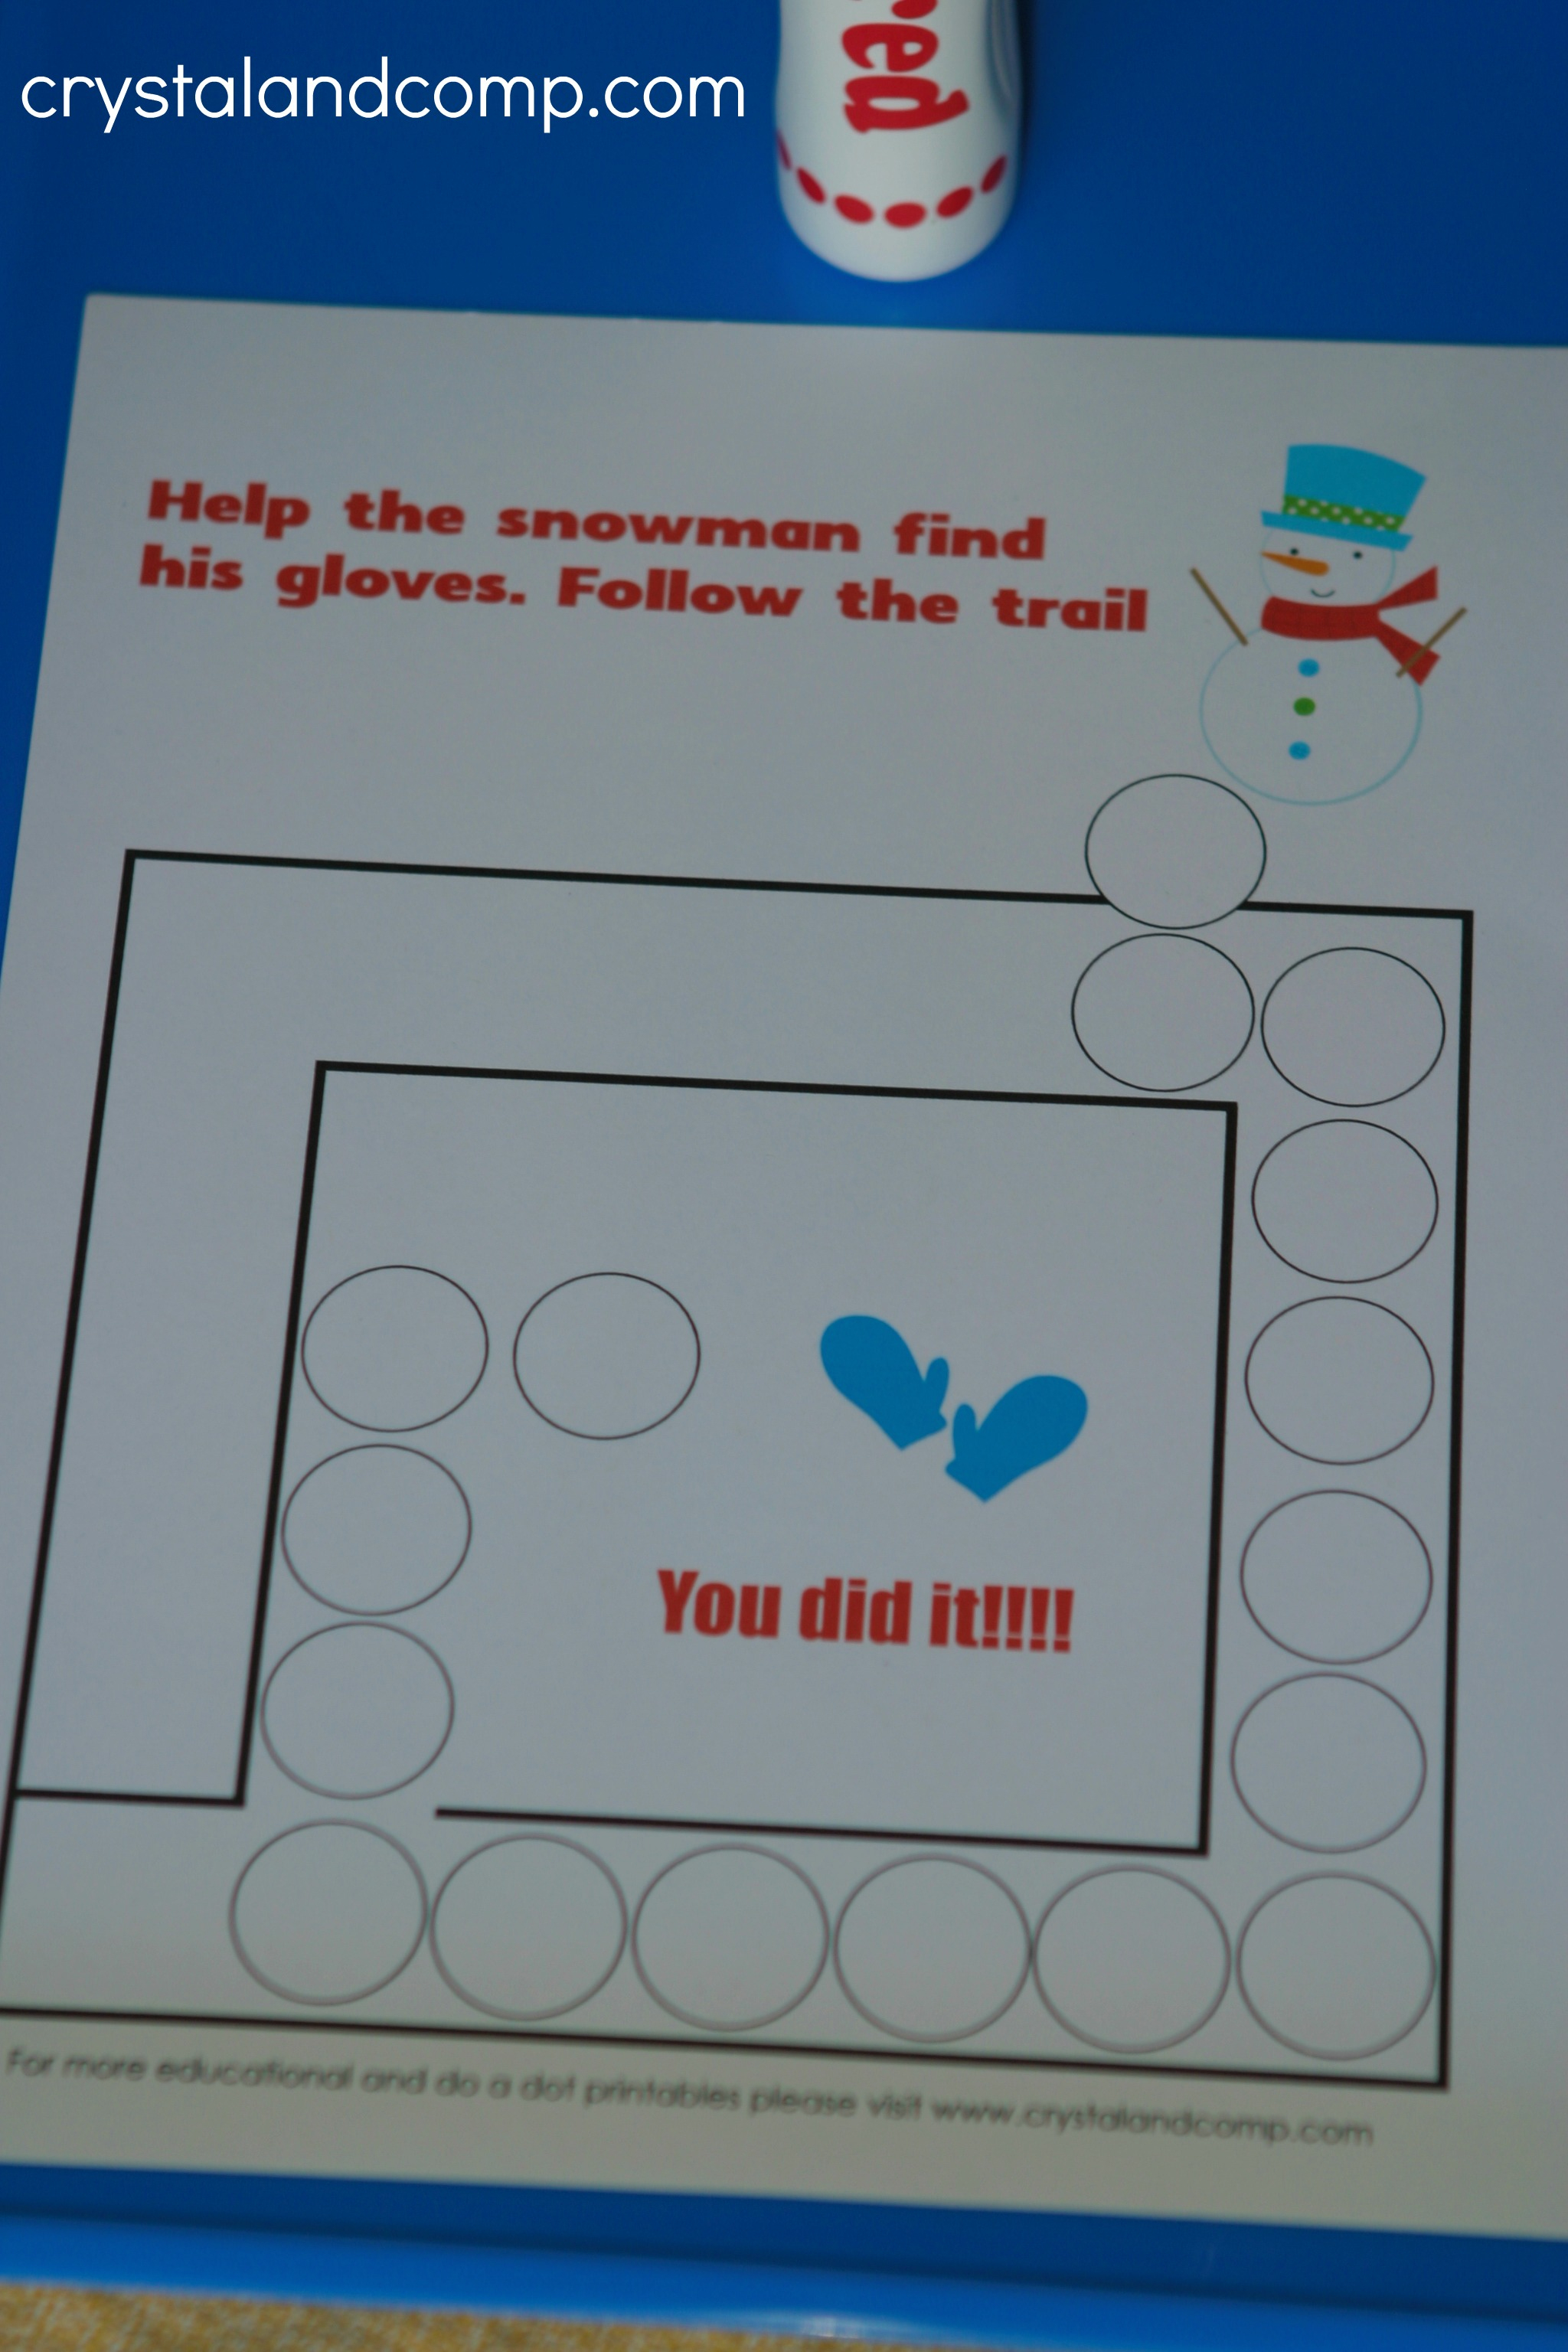 Snowman Do A Dot Printables For Preschoolers | Crystalandcomp | Snowman Worksheet Printables